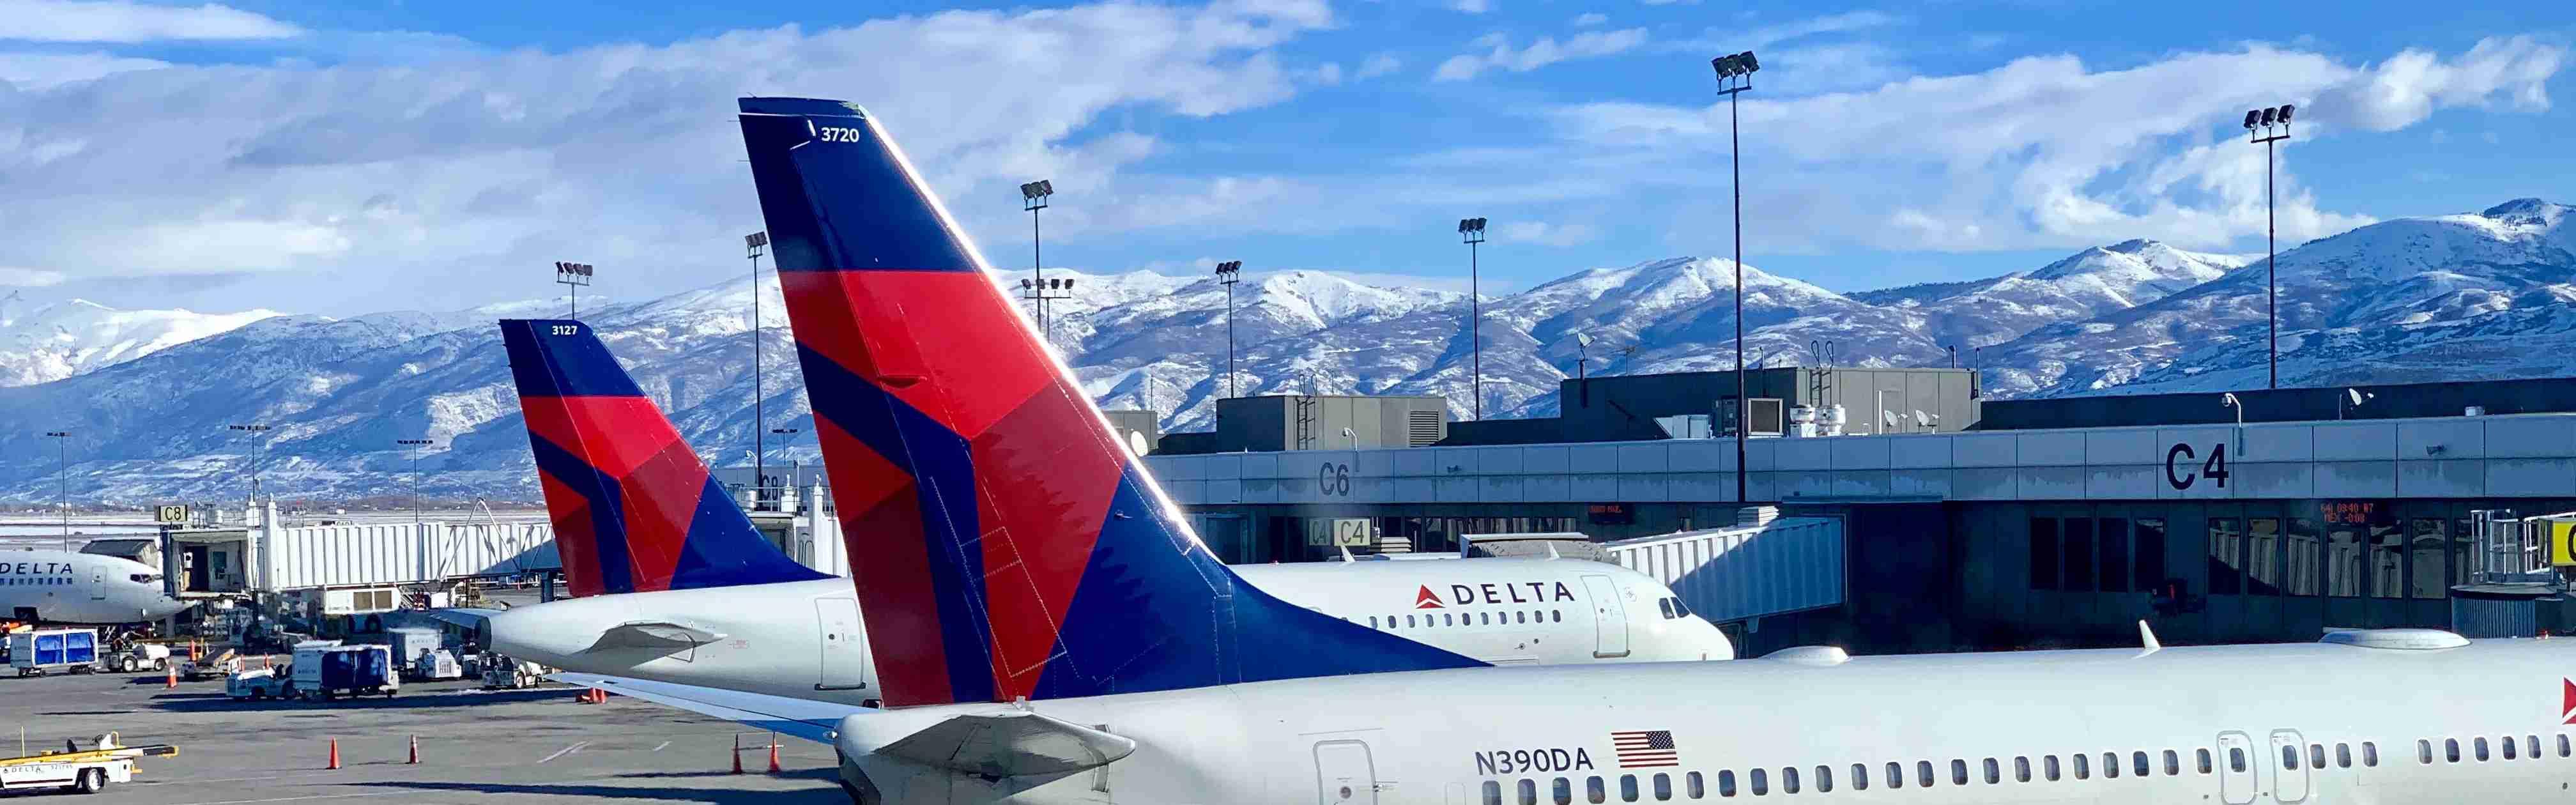 delta planes operations salt lake city slc airport